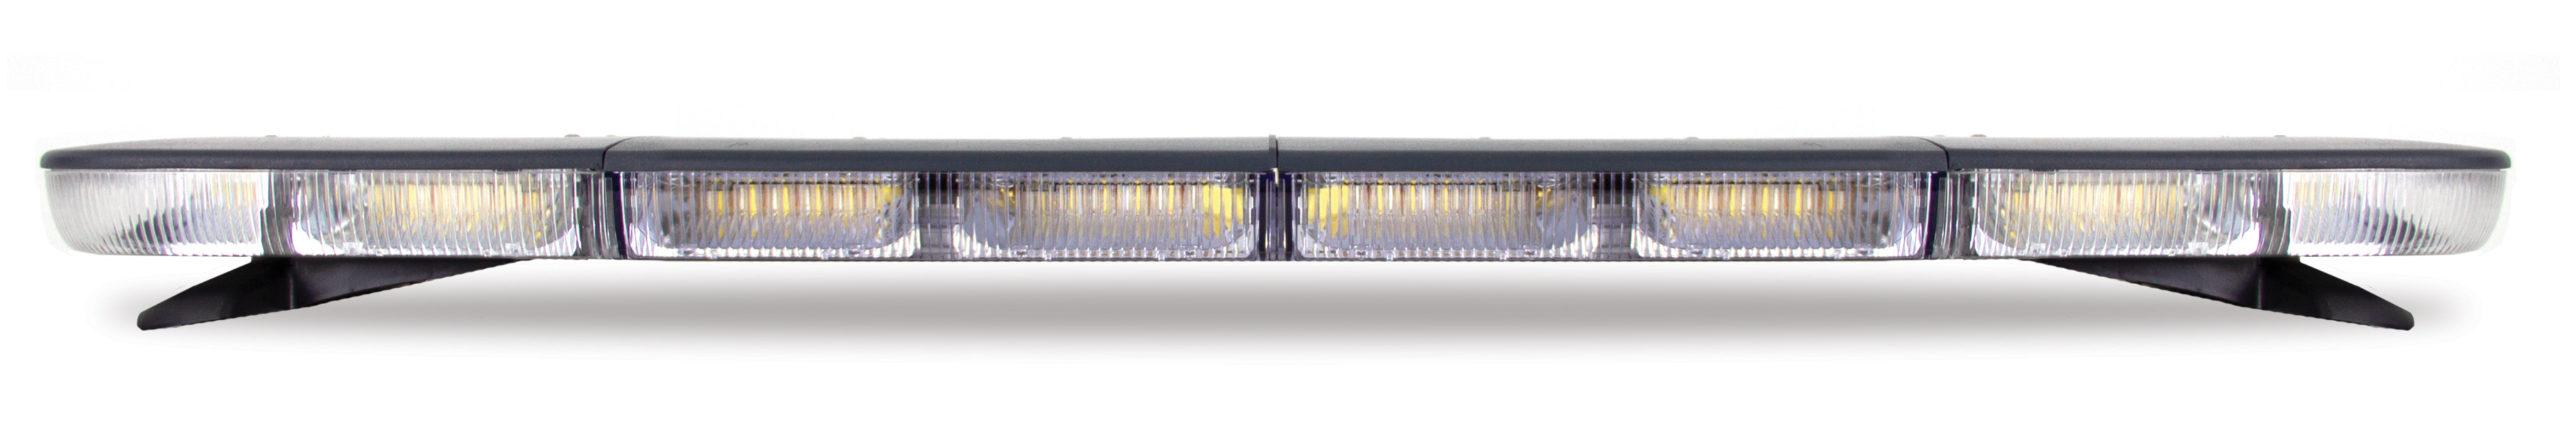 nFORCE NXT Lightbar Product Image